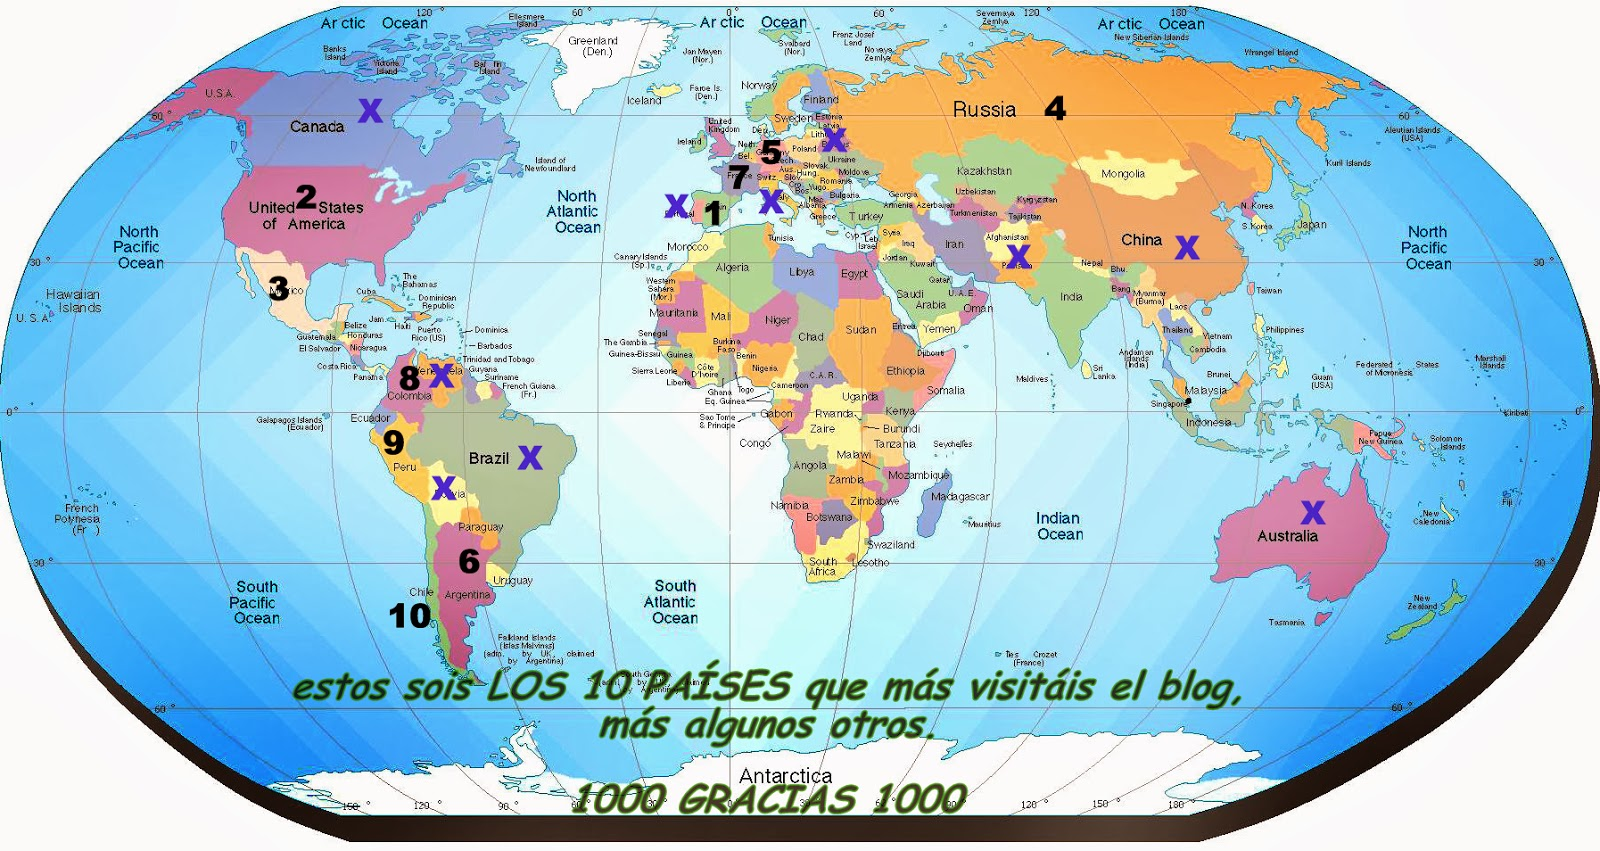 Imagenes del planisferio del mundo - Imagui